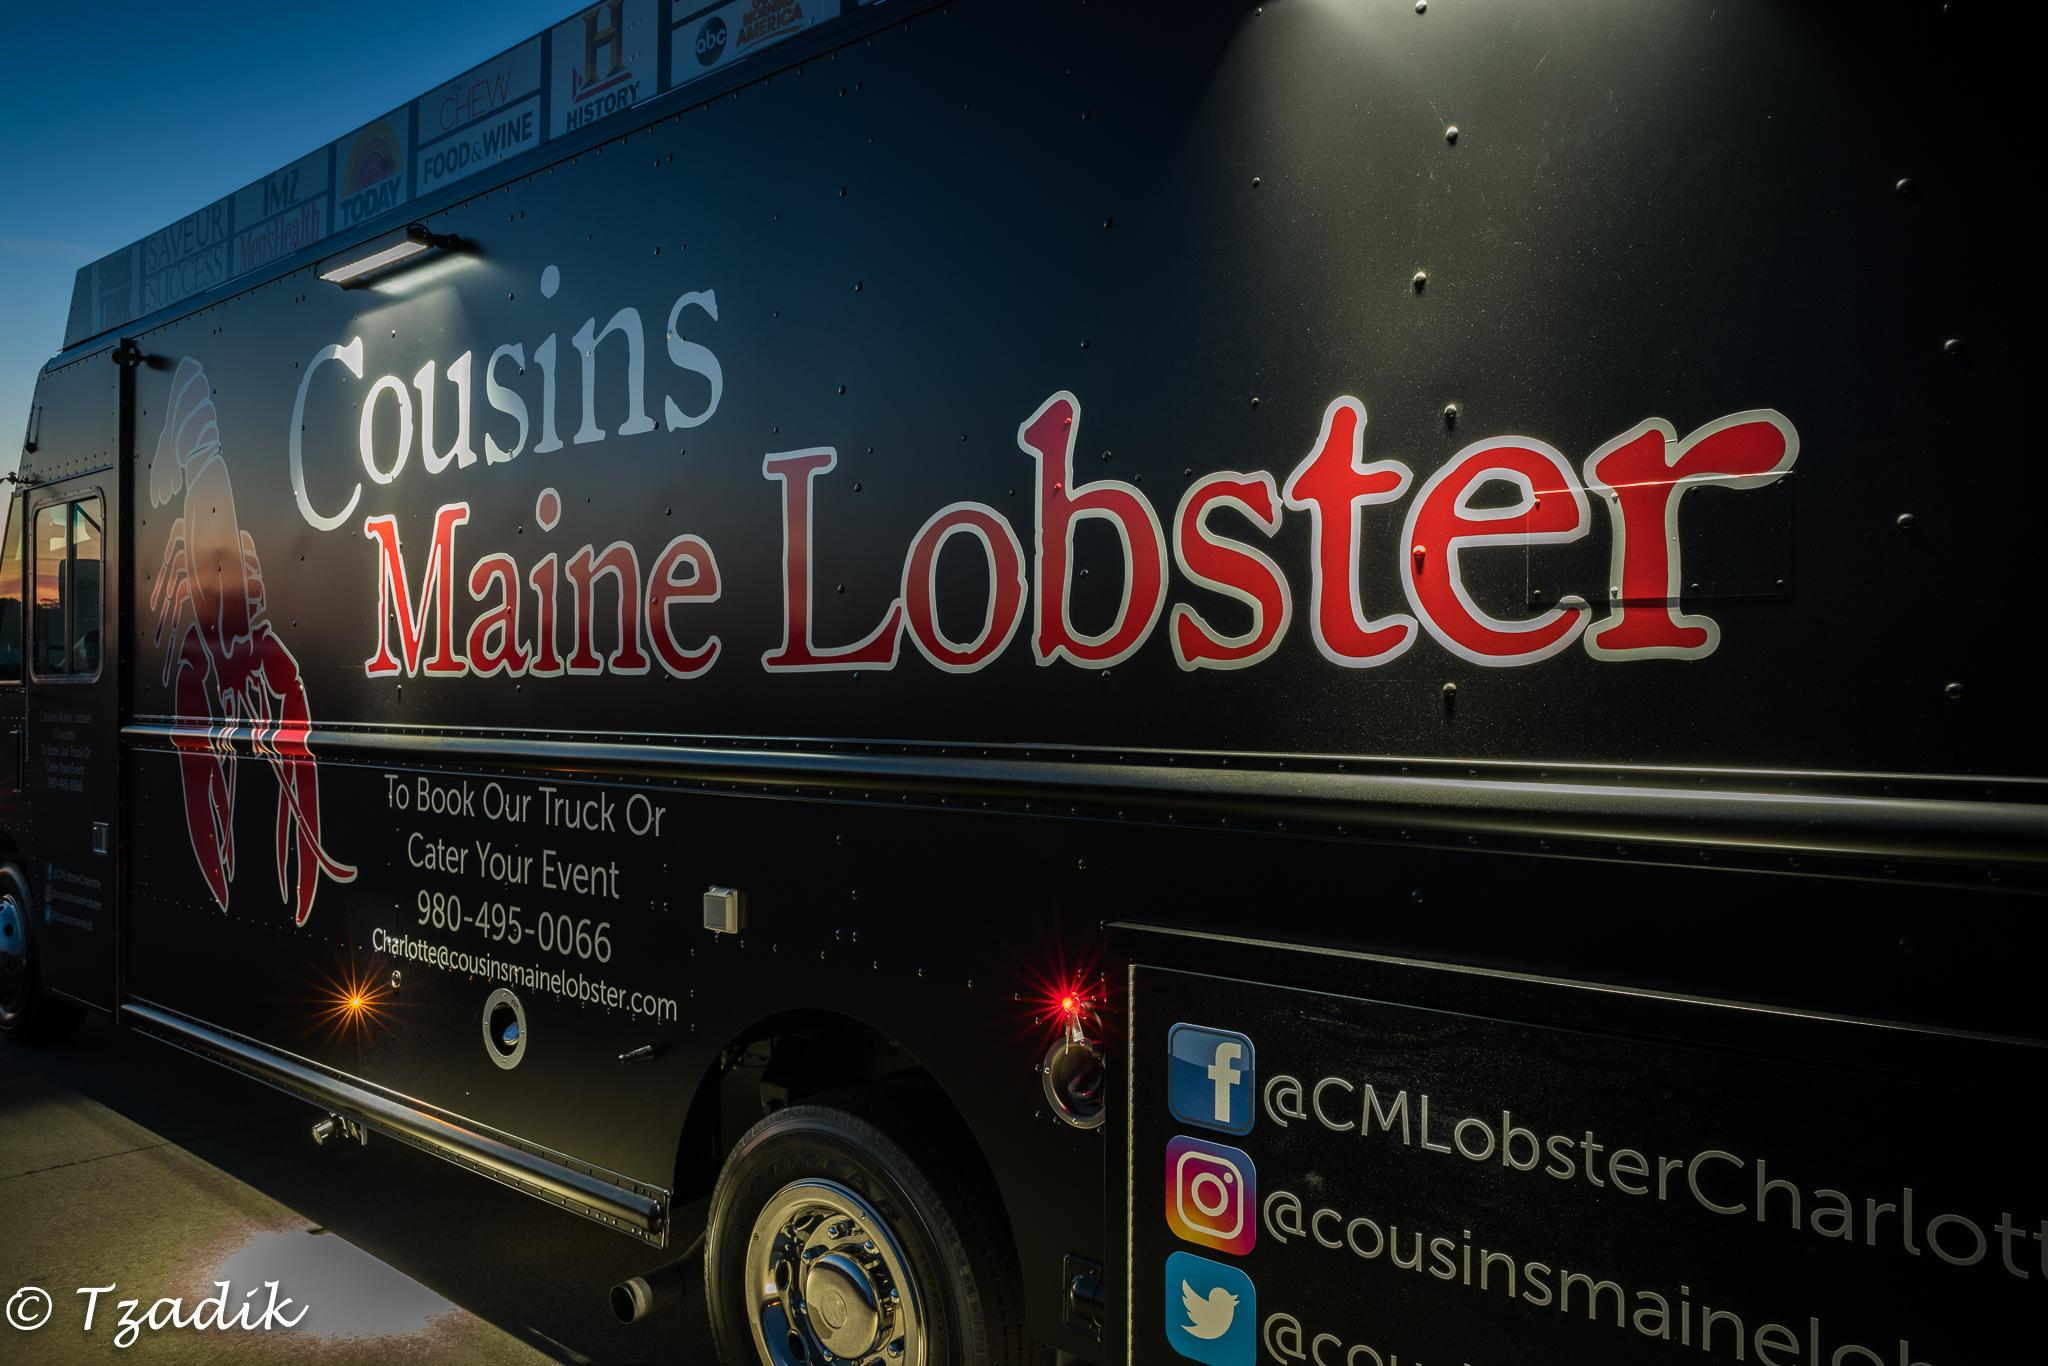 Cousins Maine Lobster-13